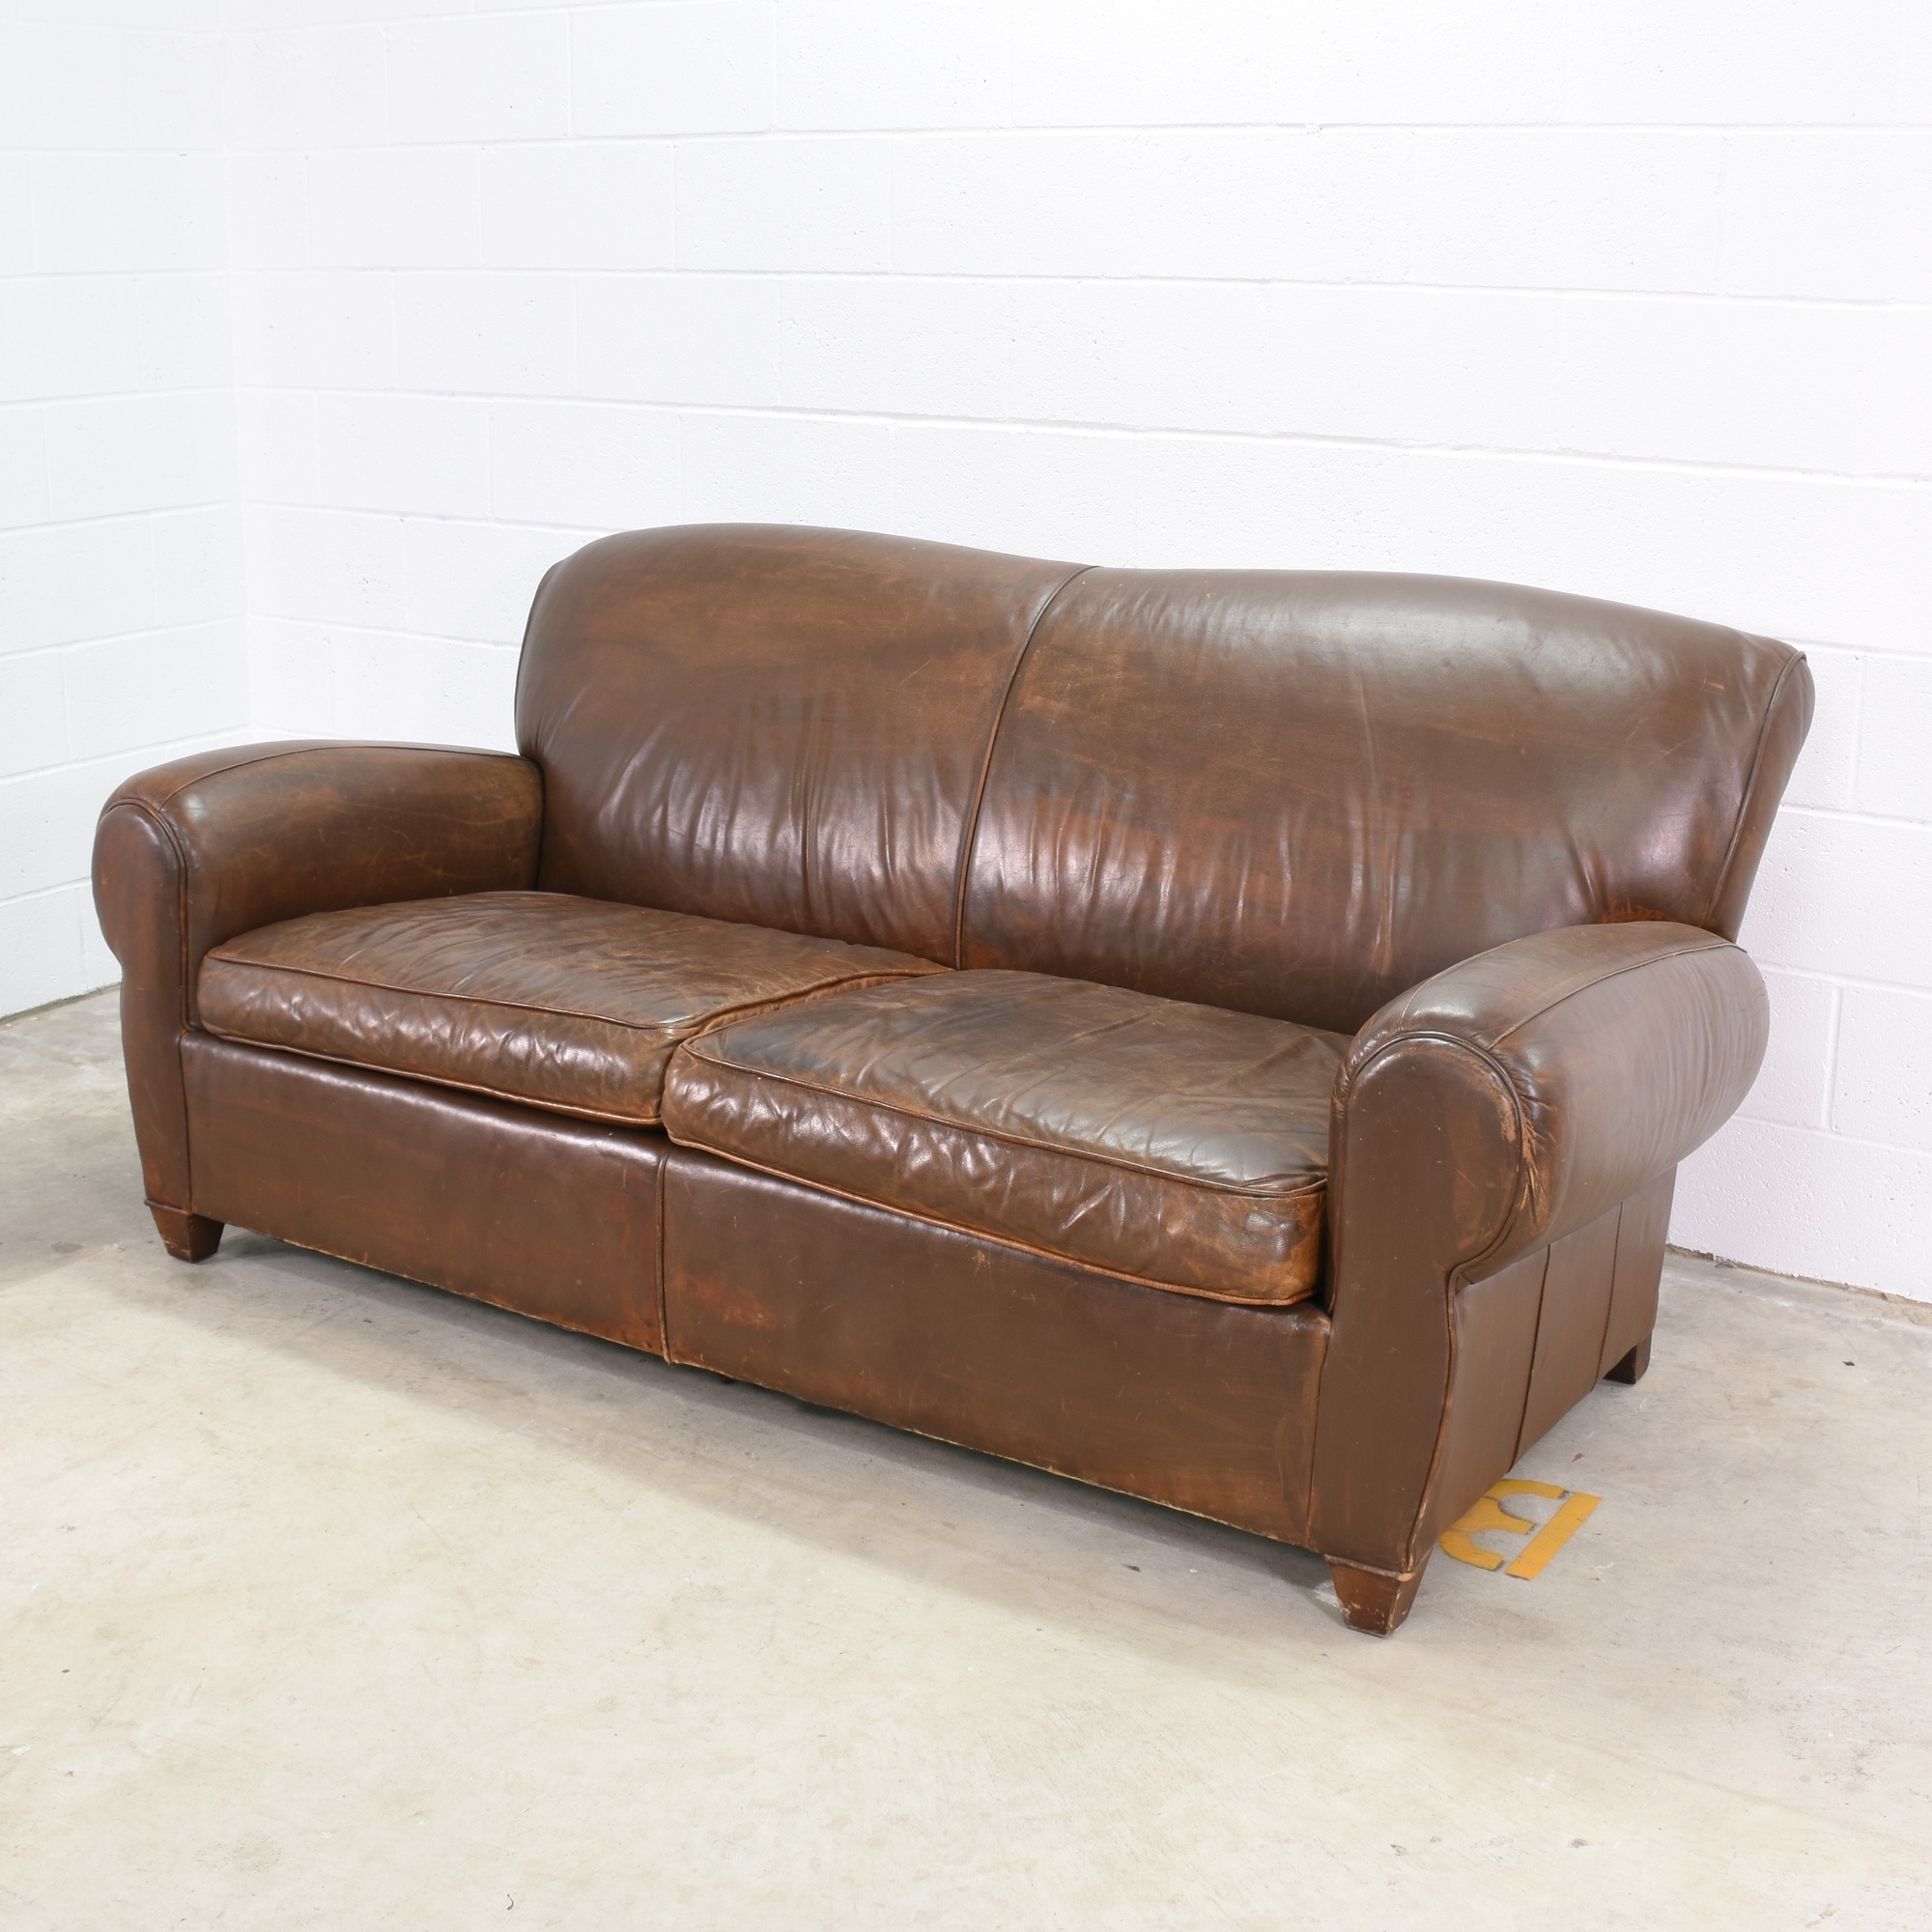 Loveseat Sofa | Loveseat Vintage Furniture San Diego & Los Angeles